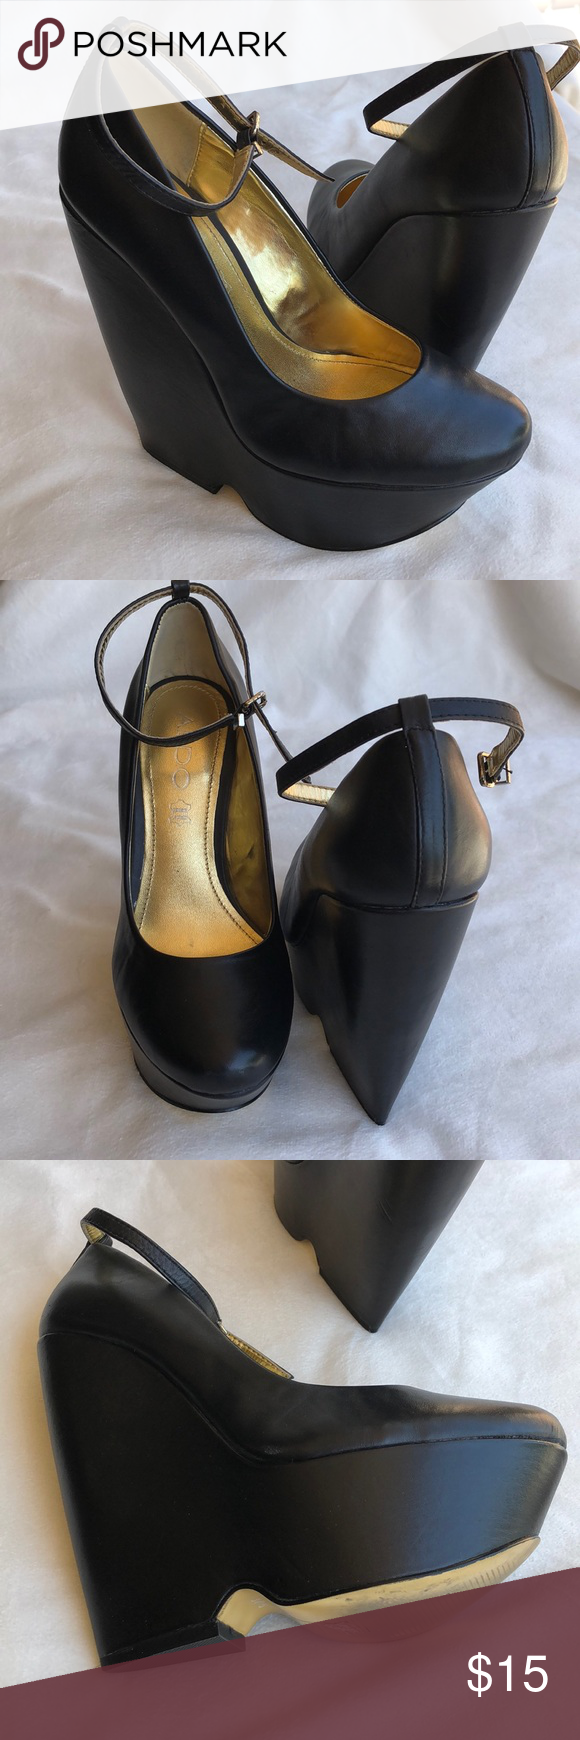 Aldo shoes, Shoes, Character shoes